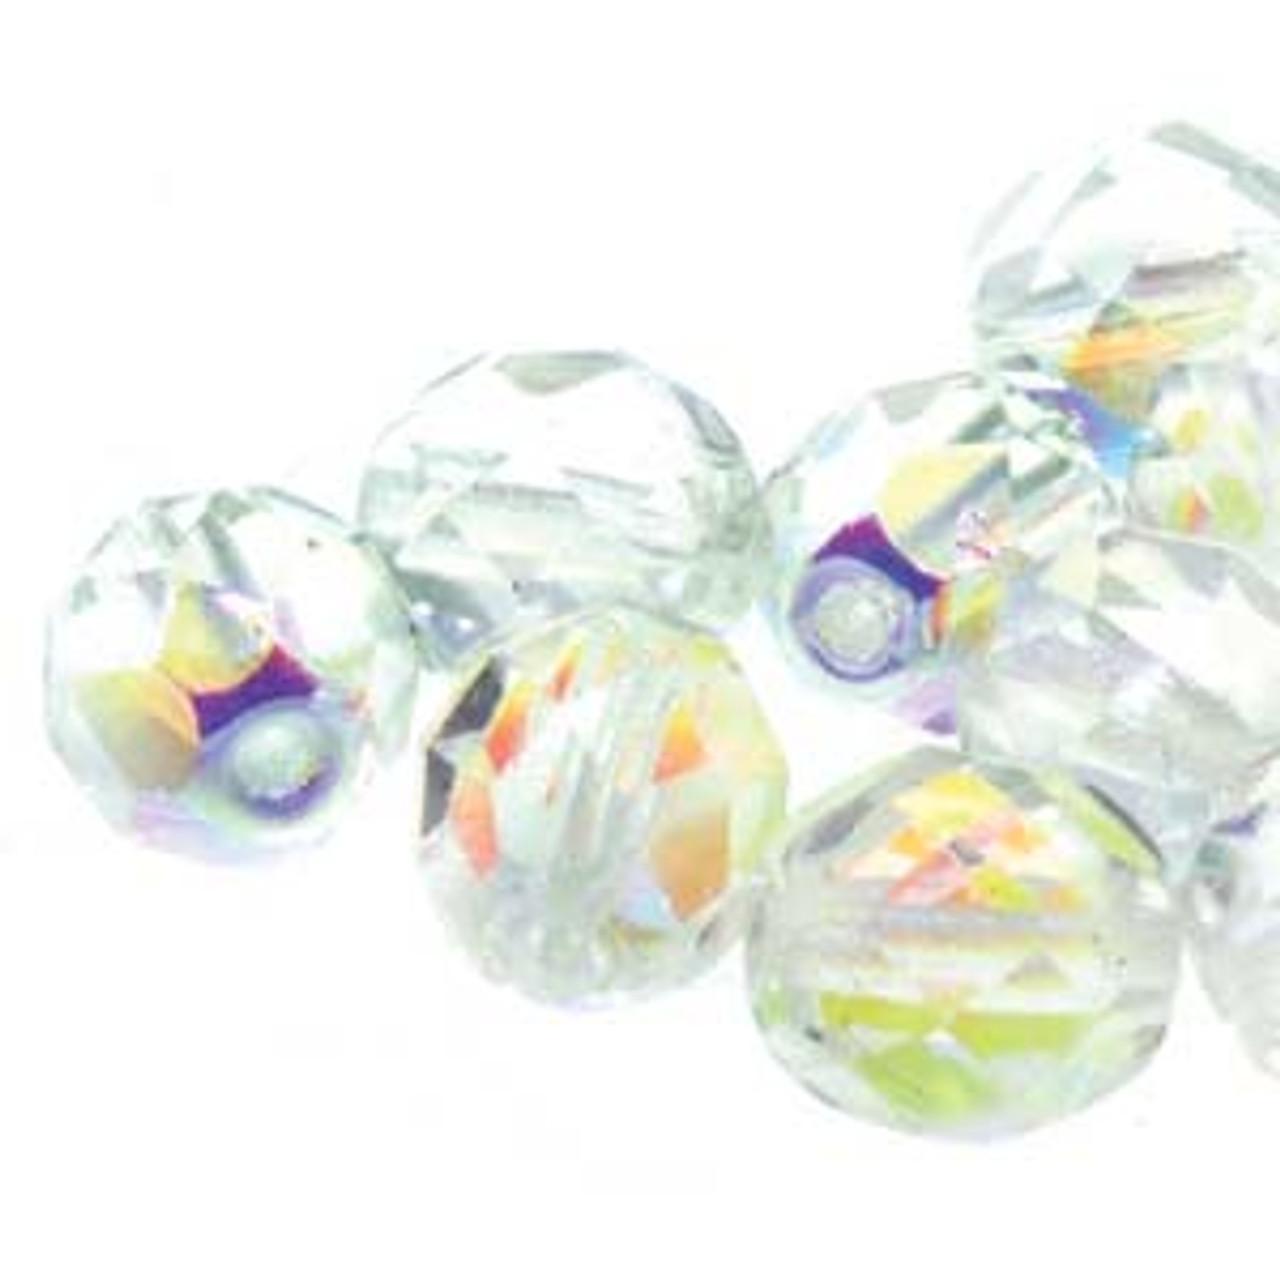 8mm Crystal AB Fire Polish Beads (19 Beads per strand)